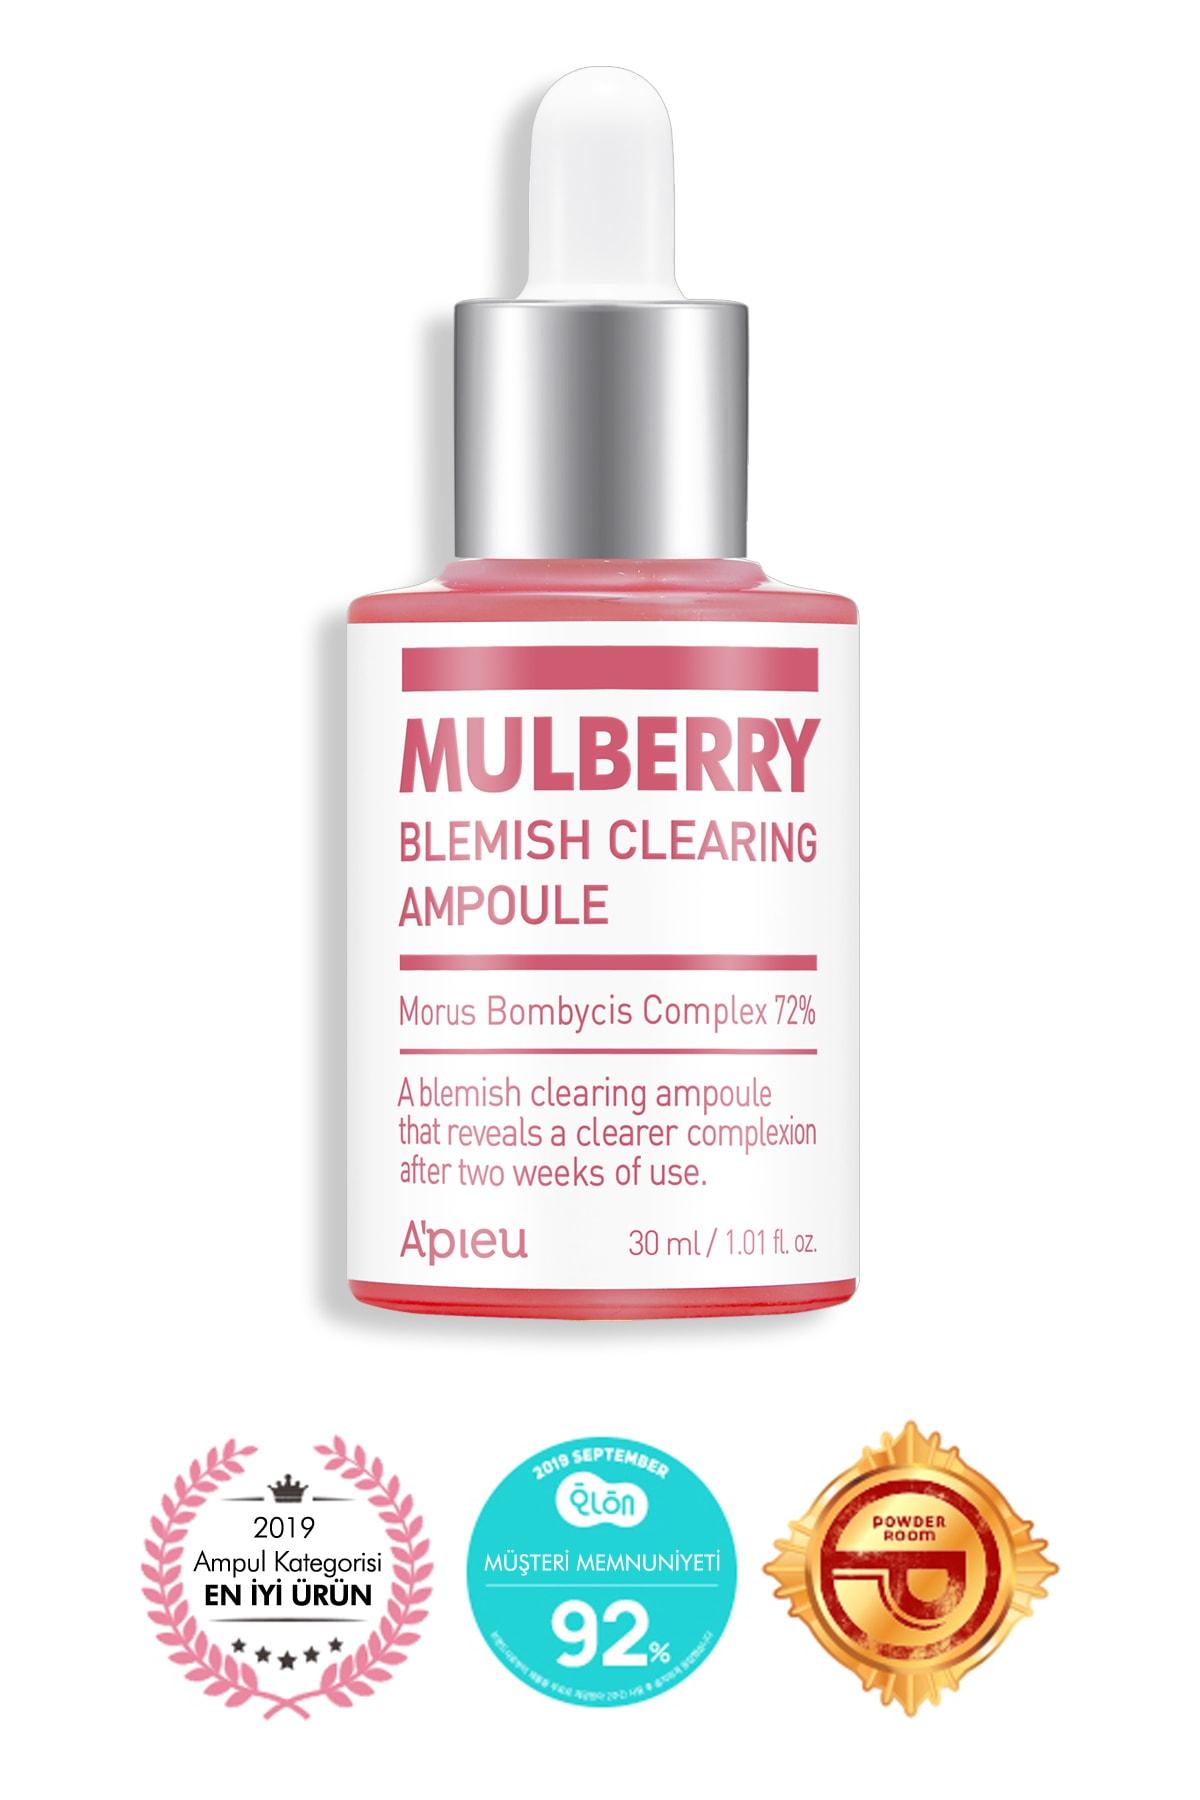 Missha Leke Karşıtı Aydınlatıcı Dut Özlü Ampul 30ml APIEU Mulberry Blemish Clearing Ampoule